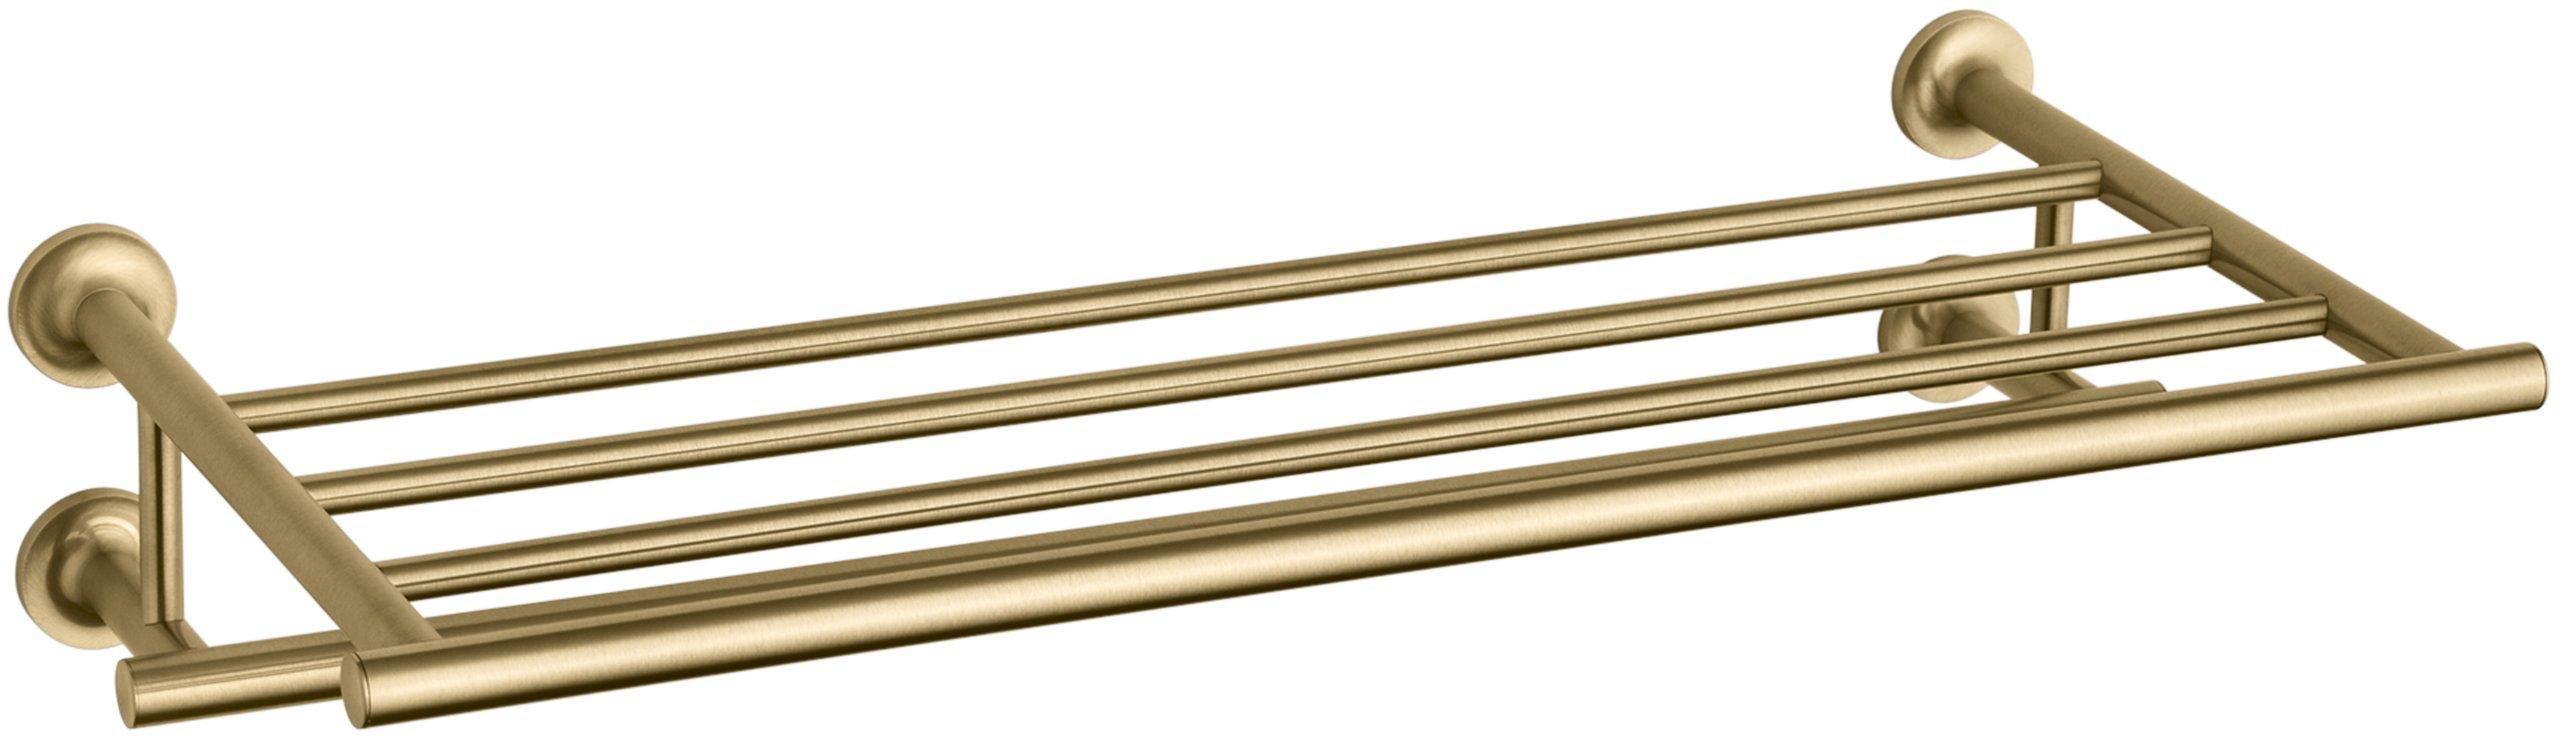 KOHLER K-14381-BGD Purist Hotelier, Vibrant Moderne Brushed Gold